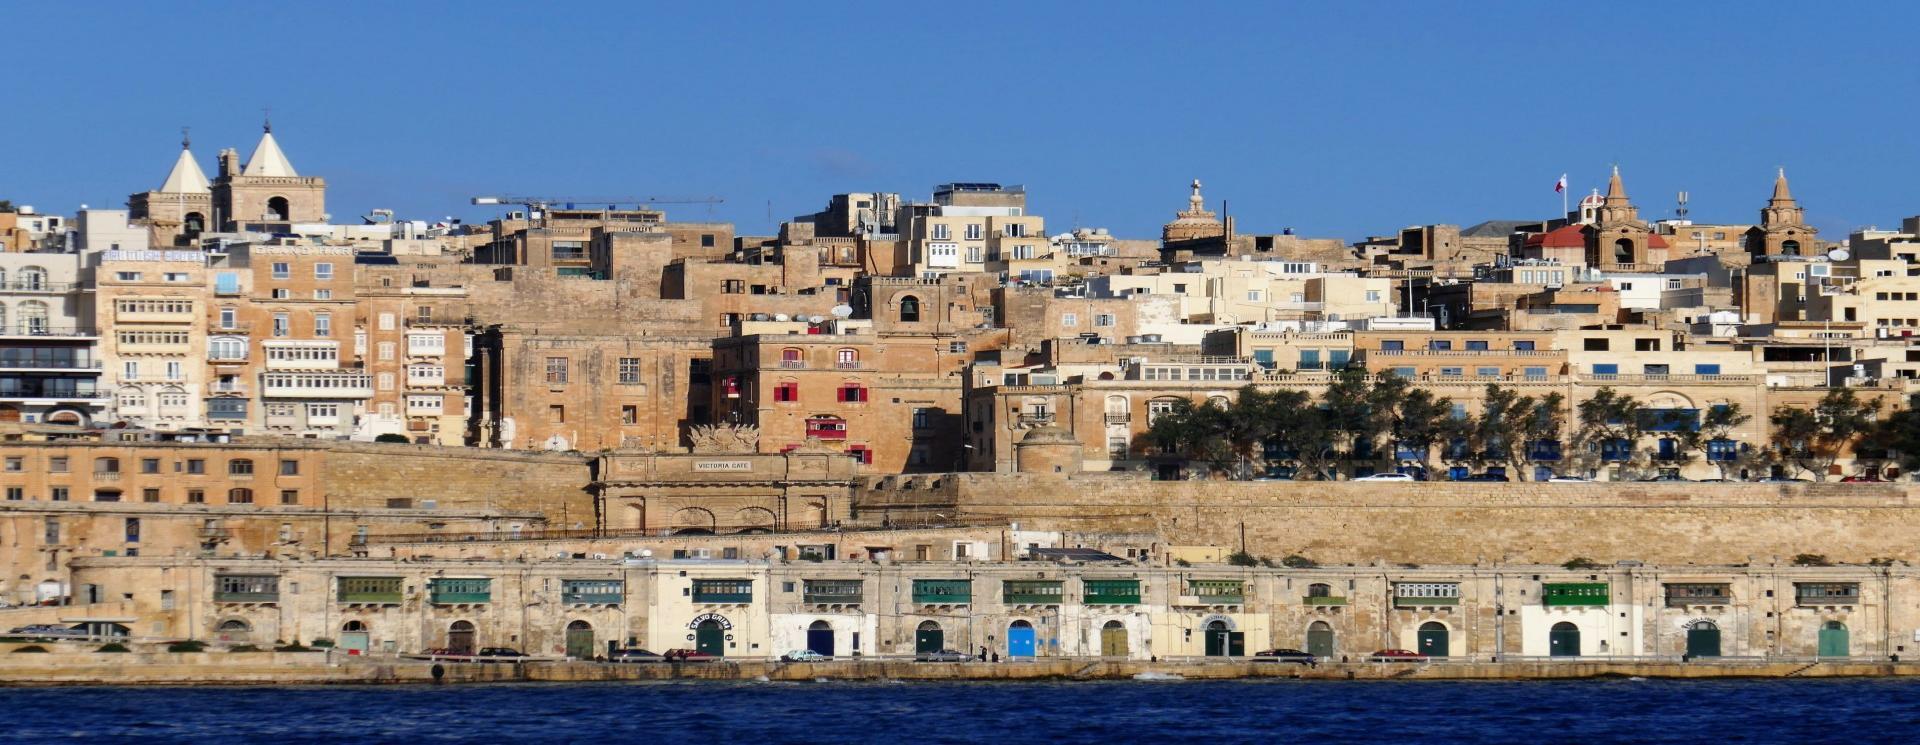 Marsaxlokk in Malta